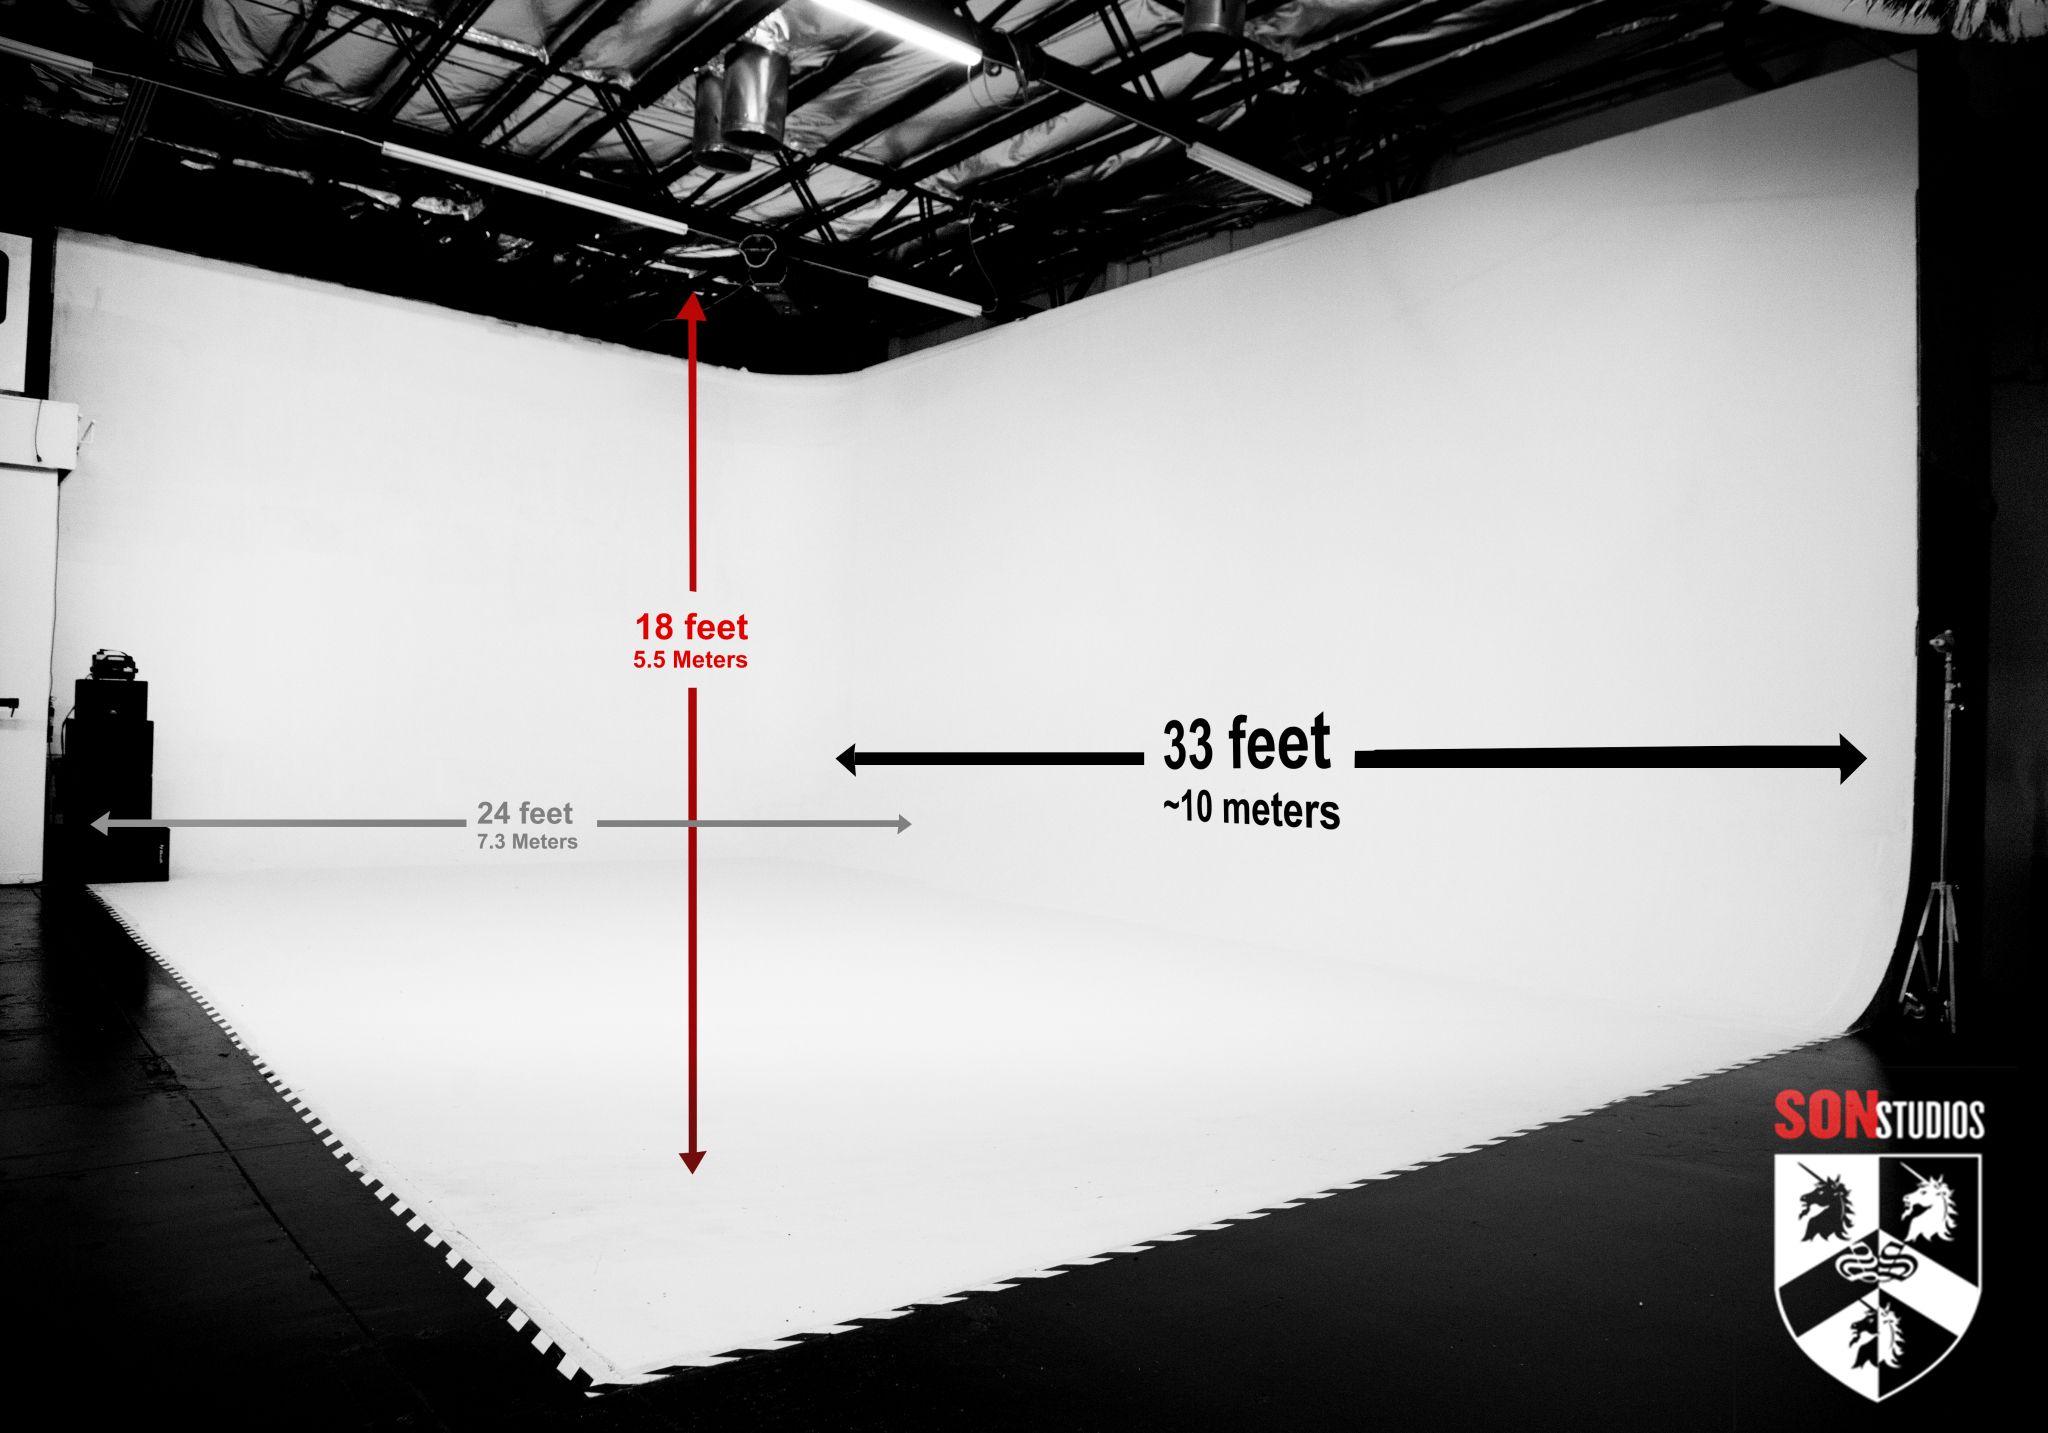 Son Studios Cyclorama Wall Measurements Photo Studio Design Design Studio Office Photography Studio Design